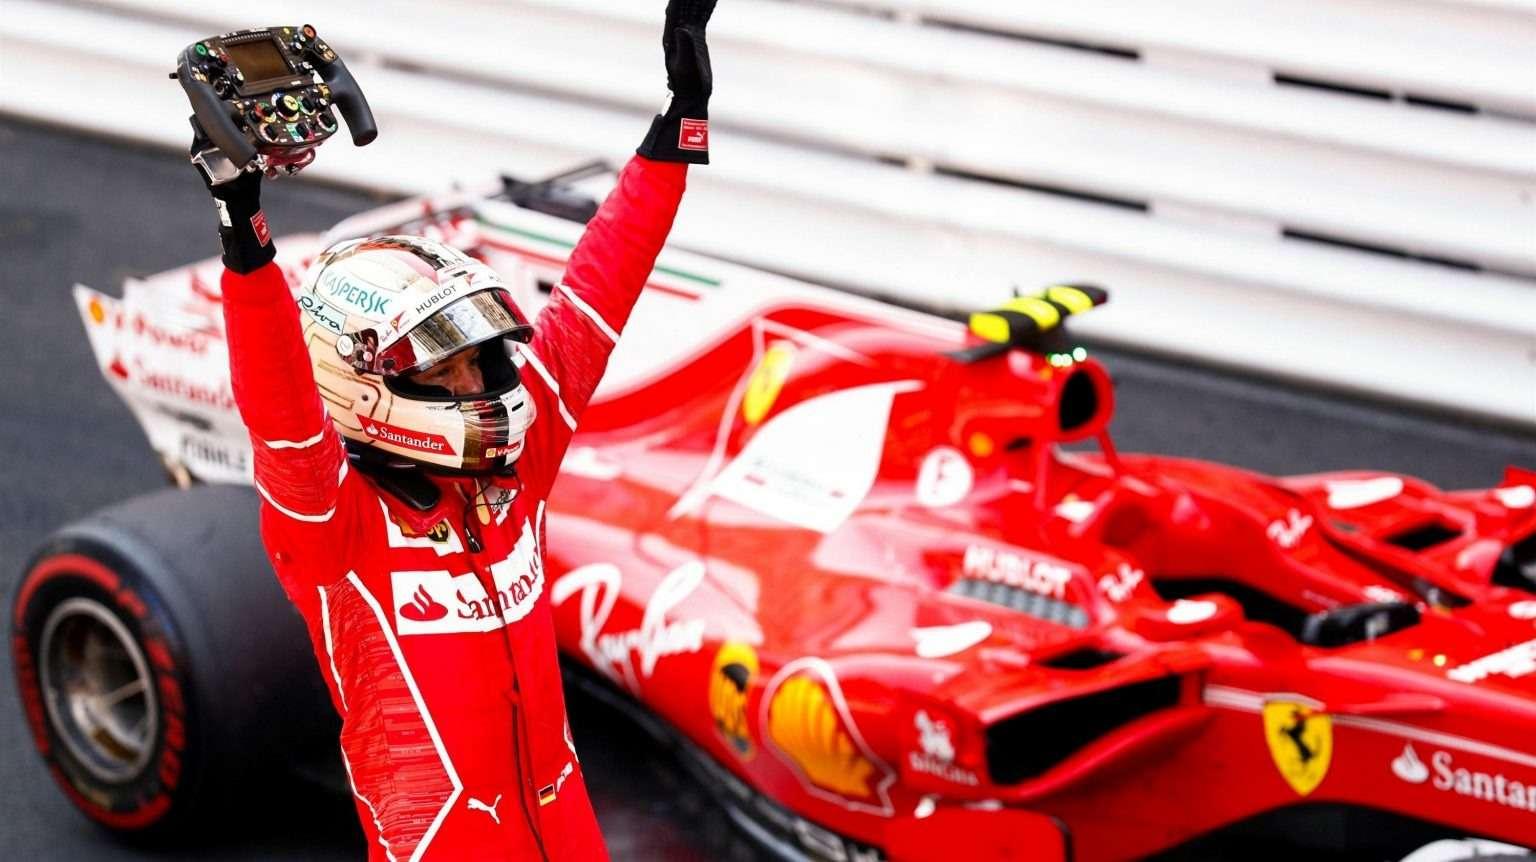 Формула 1, Гран-При Монако, Ferrari, Кими Райкконен, Себастьян Феттель, Даниэль Риккьярдо, Даниил Квят, Льюис Хэмилтон